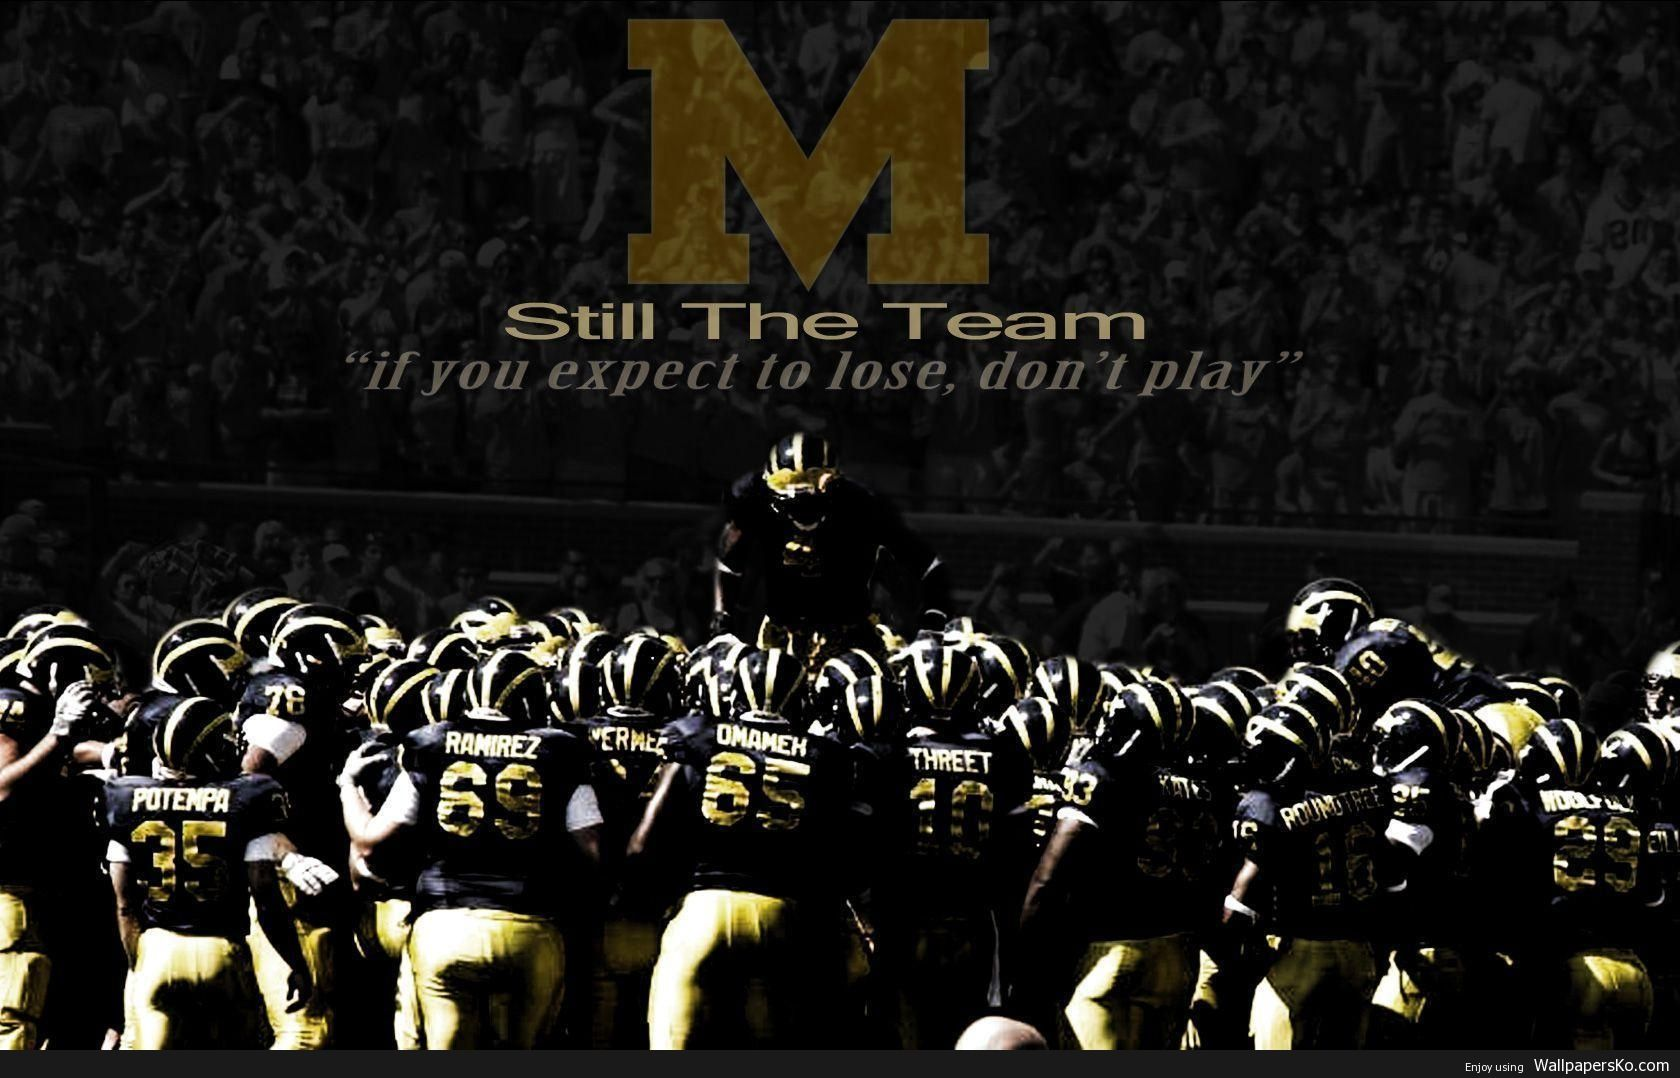 Michigan Football Wallpaper Http Wallpapersko Com Michigan Football Wallpaper Html Hd Wall Michigan Football Michigan Go Blue Michigan Wolverines Football